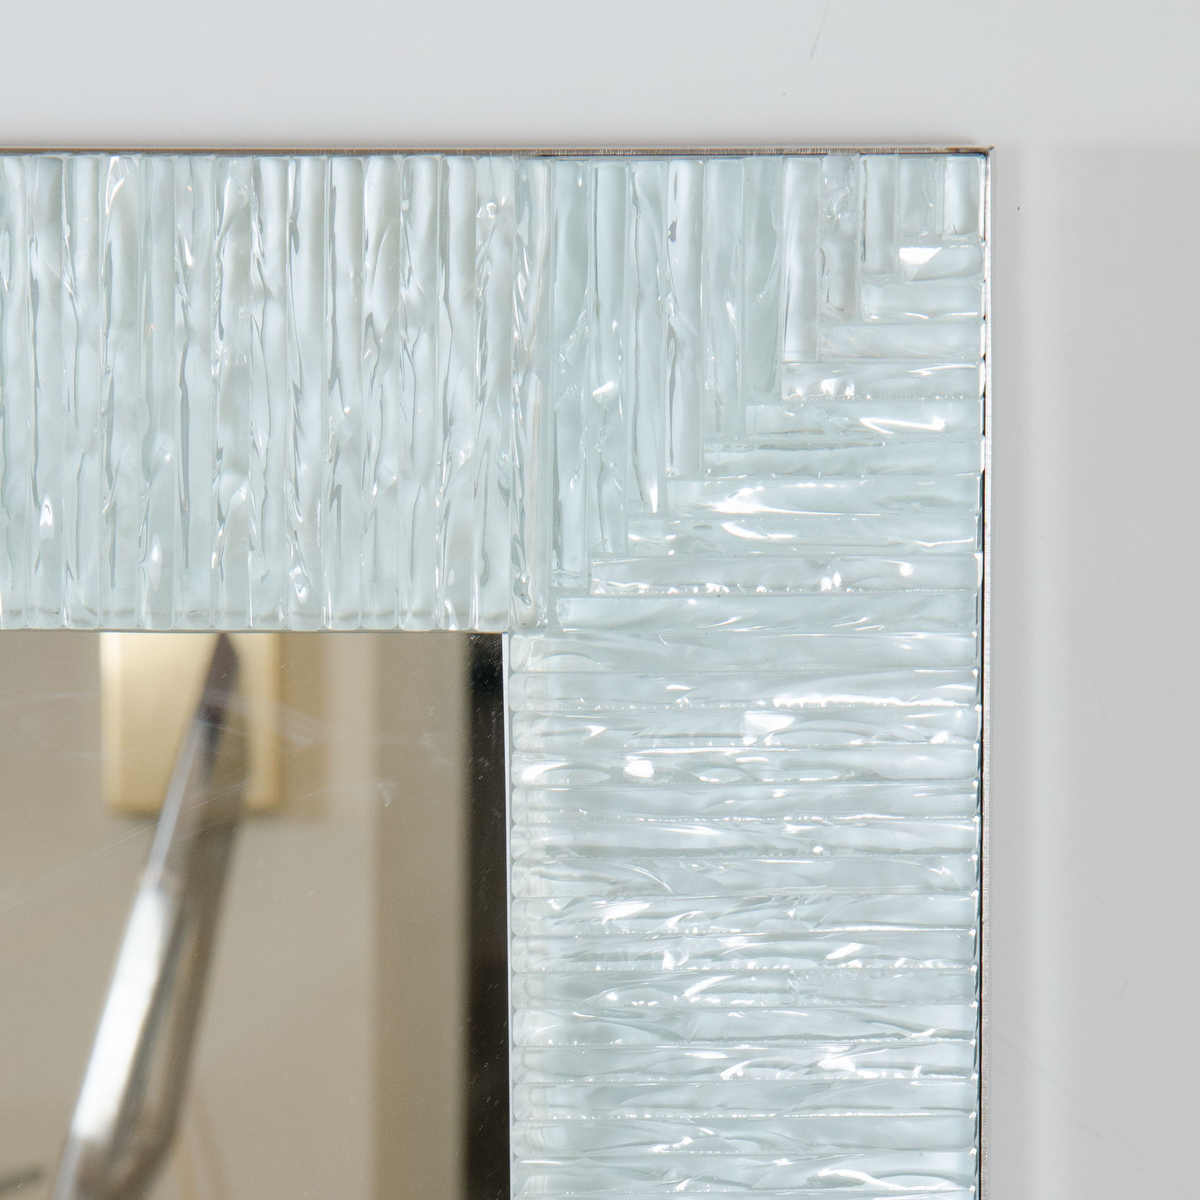 Fragmented Glass Surround Mirror Wall John Salibello